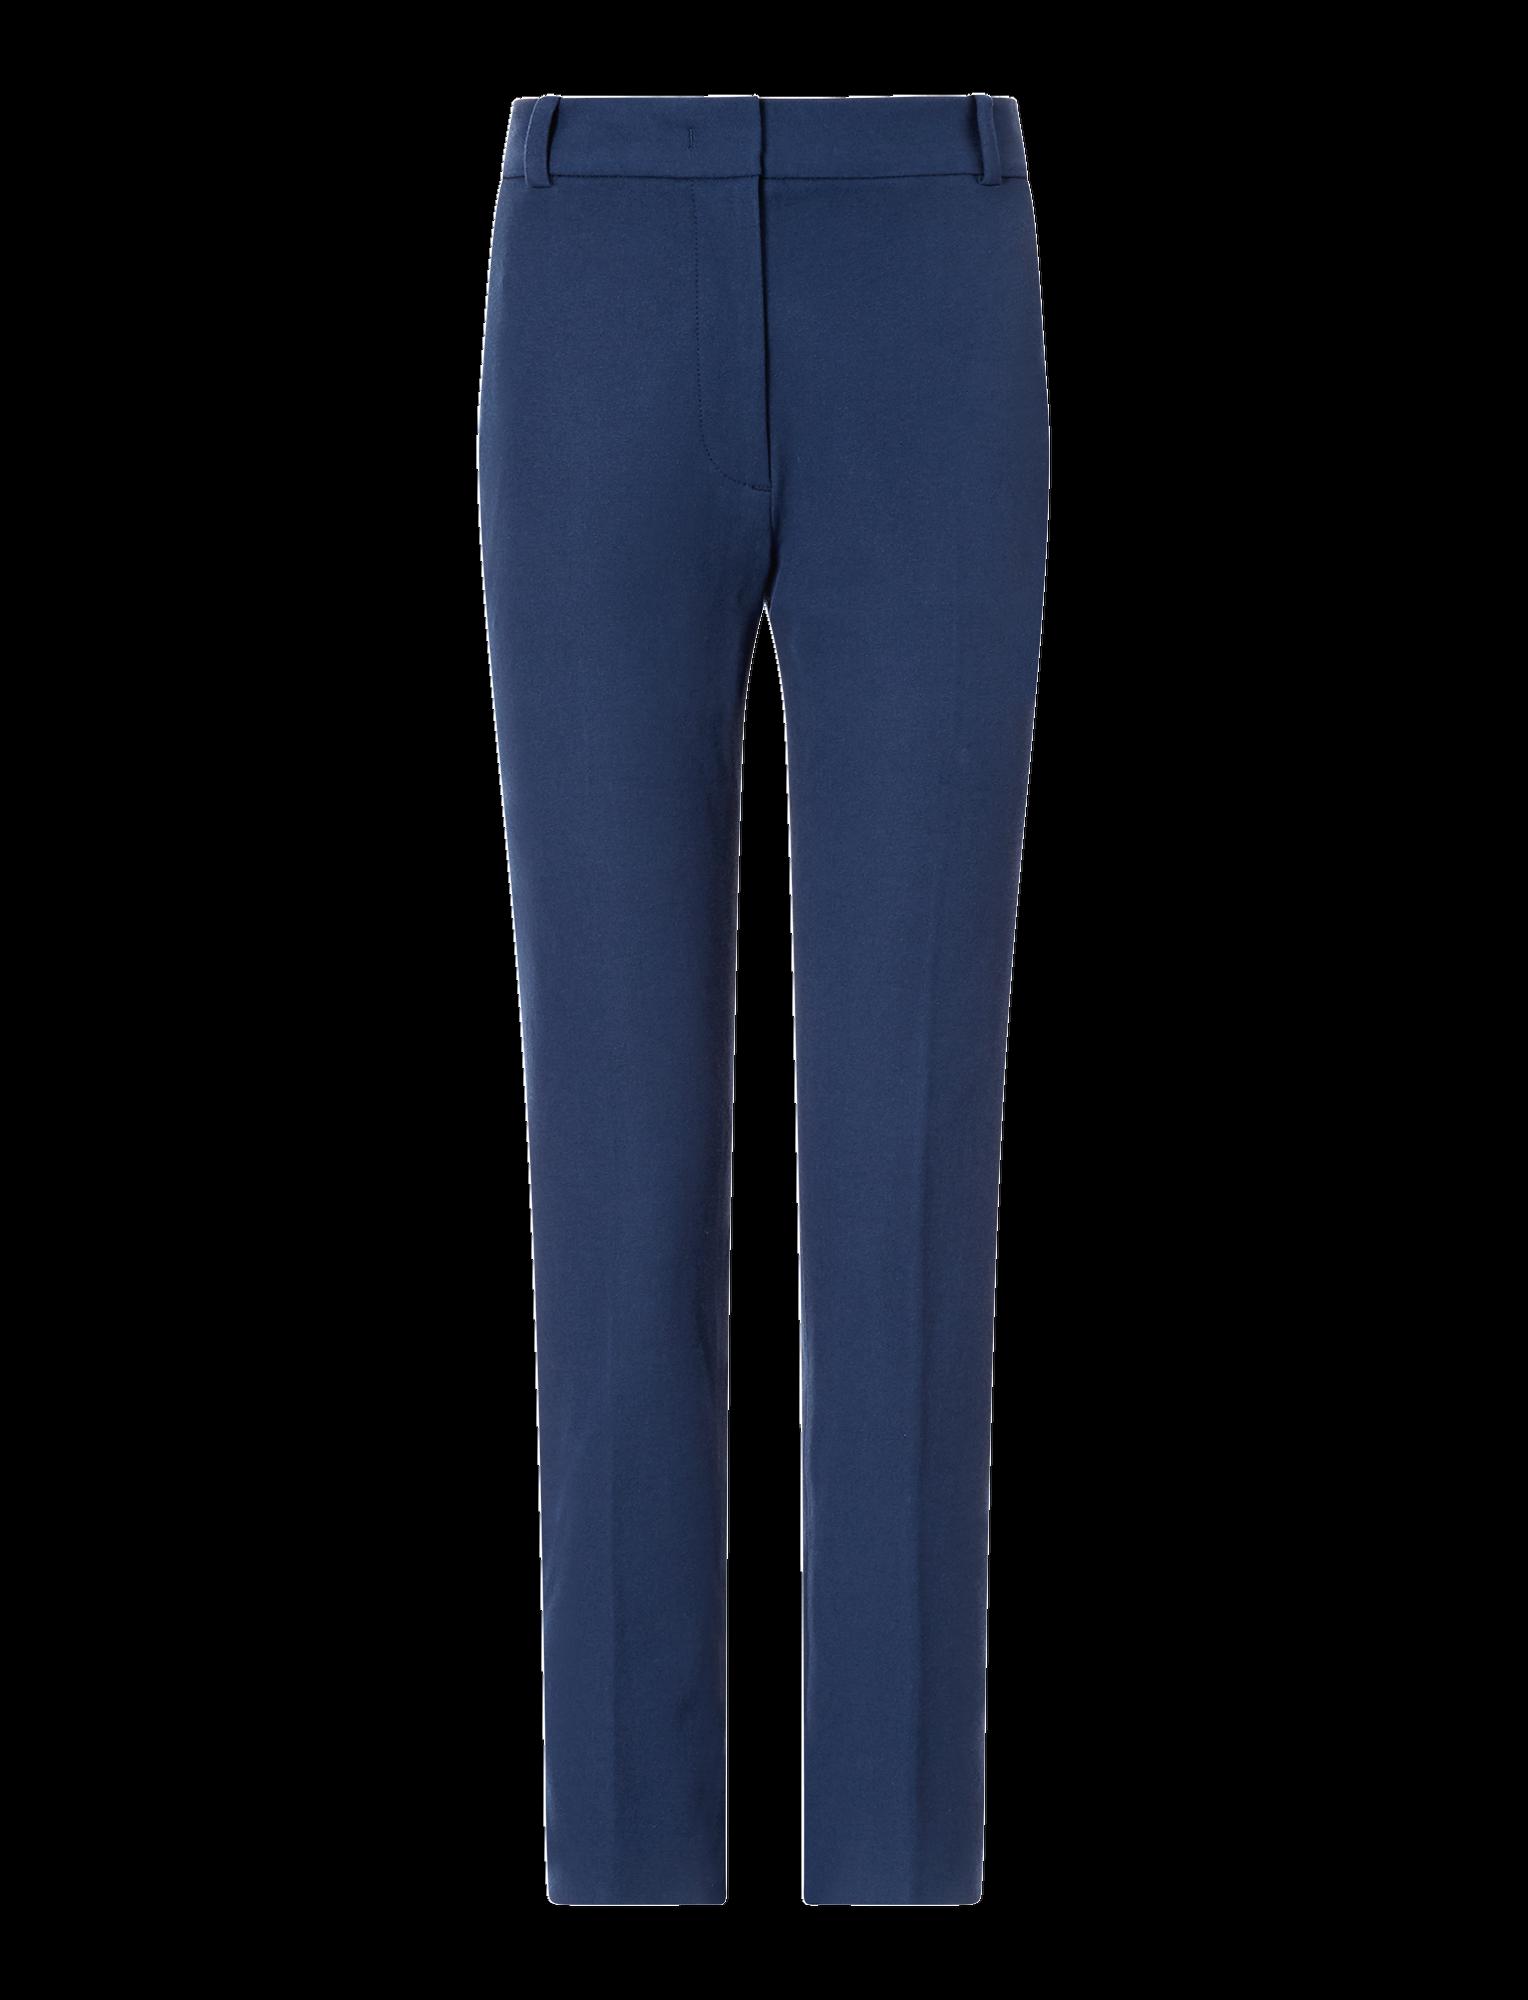 Joseph, Zoom Gabardine Stretch Trousers, in ENCRE